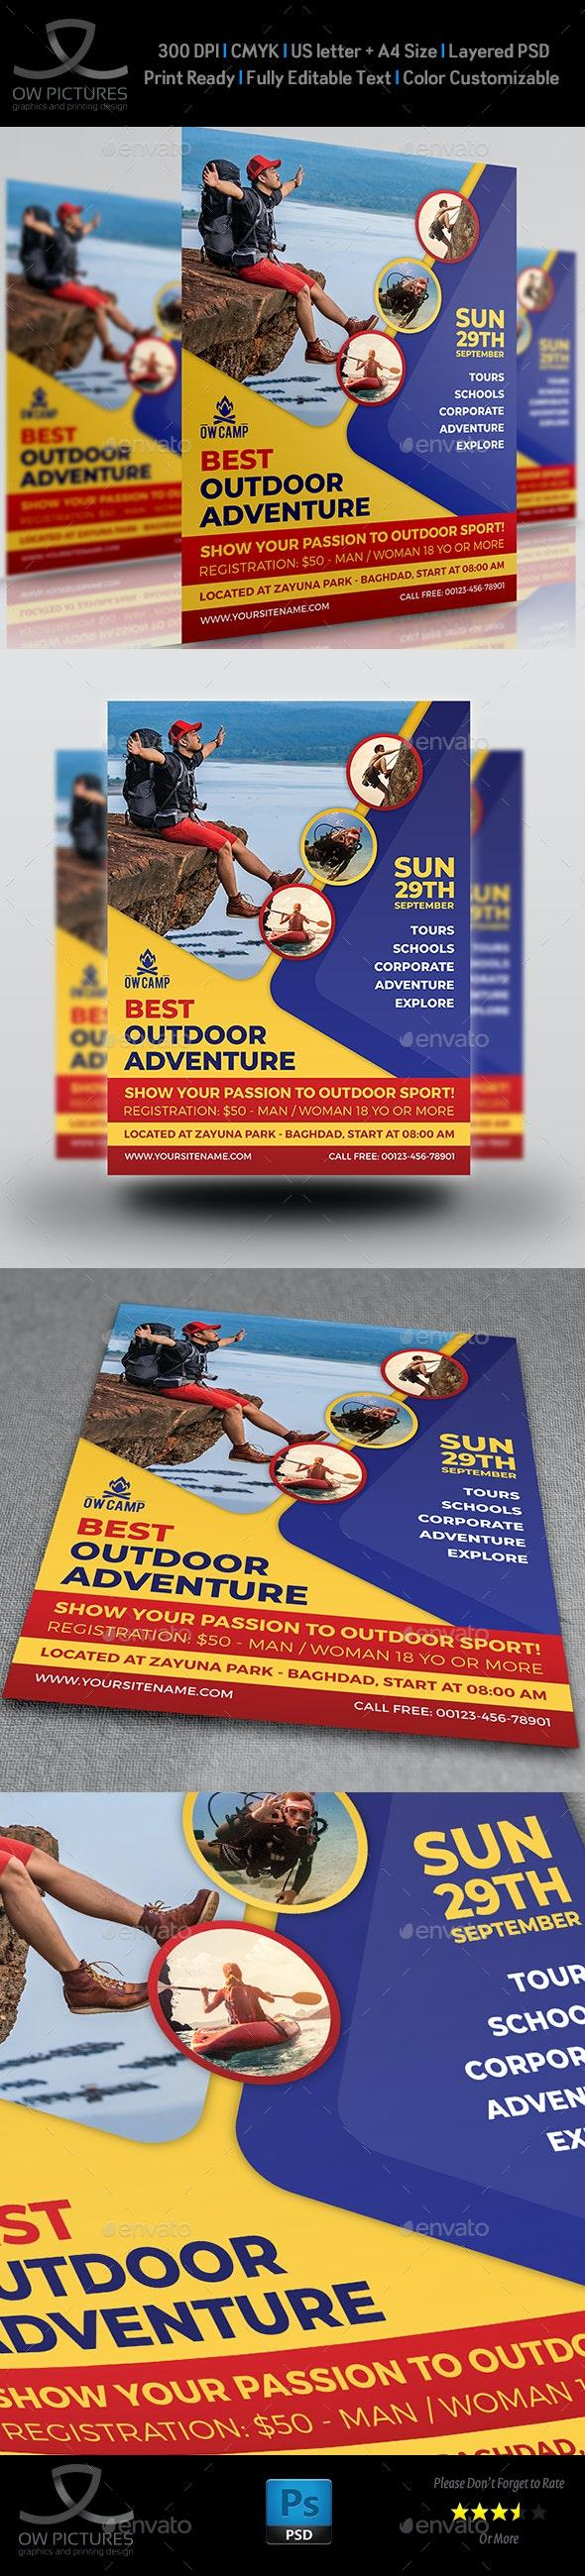 Outdoor Adventure Flyer Template - Flyers Print Templates